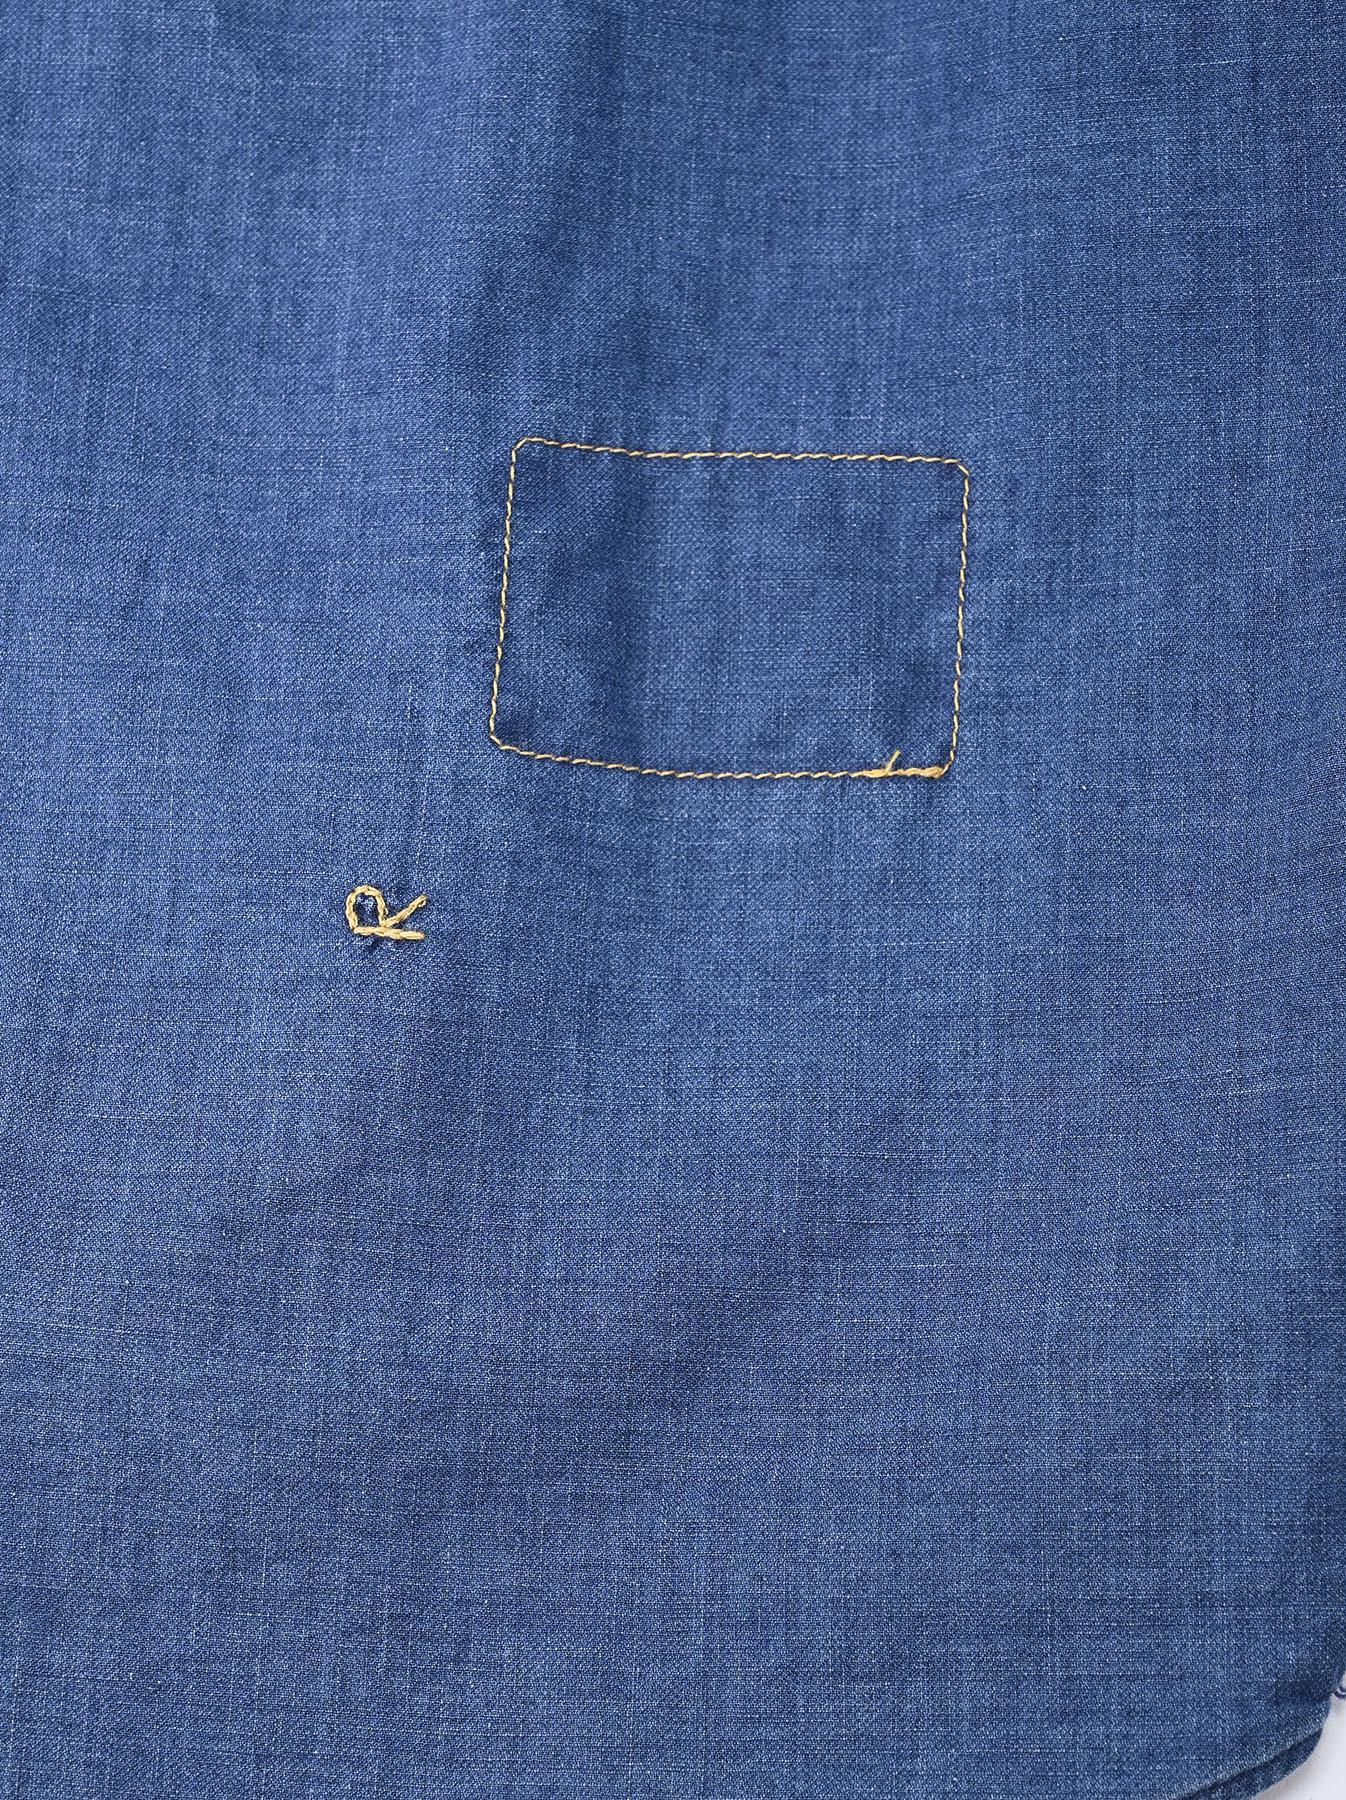 Indigo Gauze 908 Ocean Shirt Distressed-11